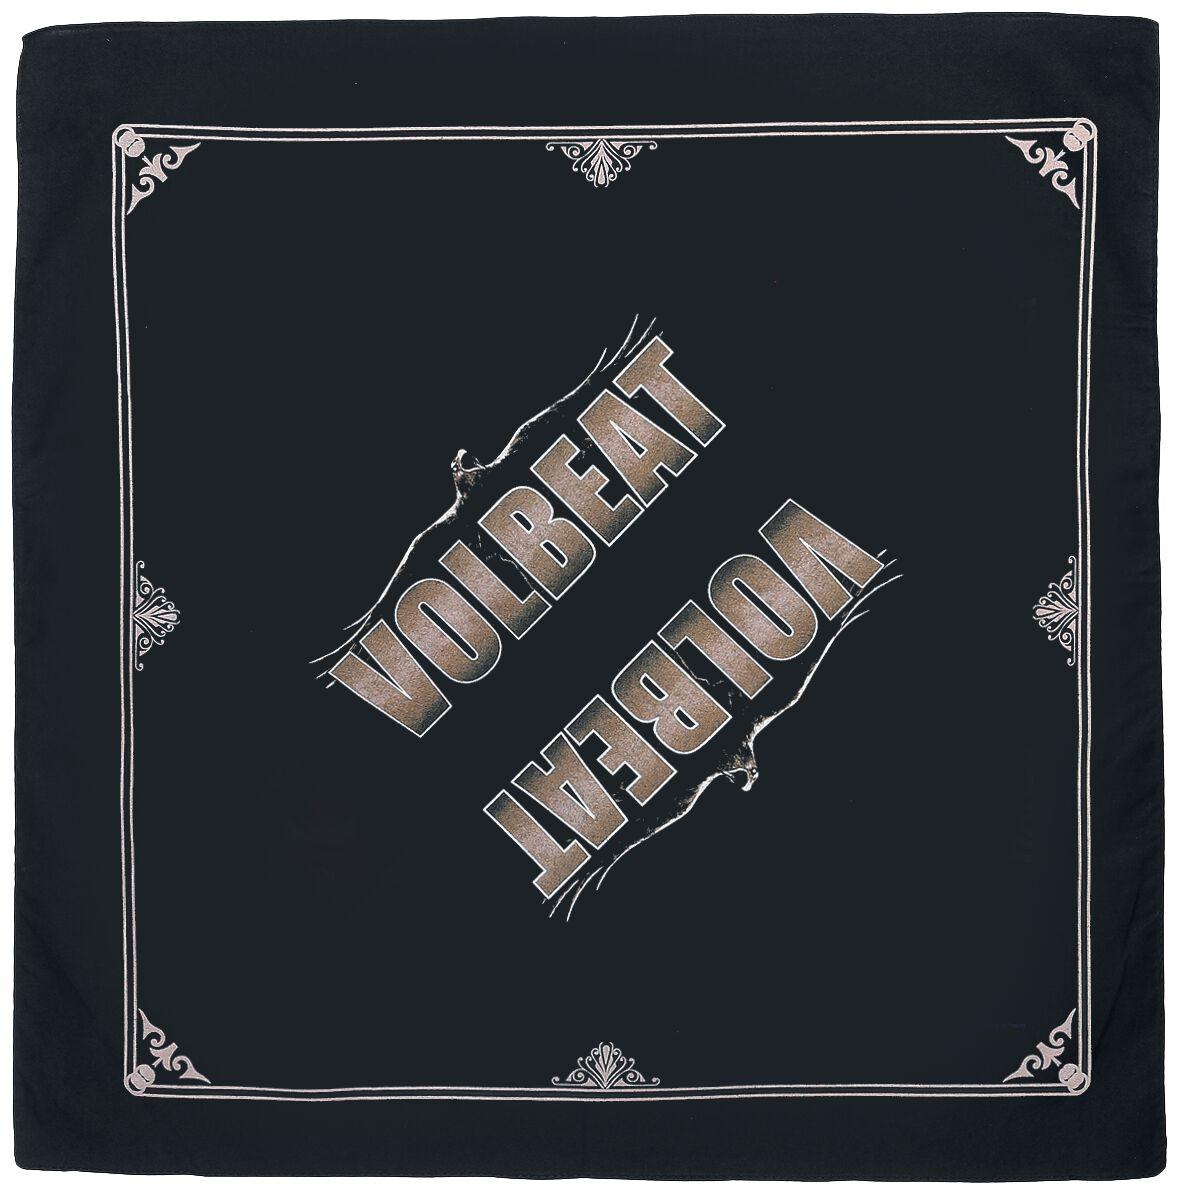 Zespoły - Czapki i Kapelusze - Bandana Volbeat Raven Logo Bandana wielokolorowy - 356968